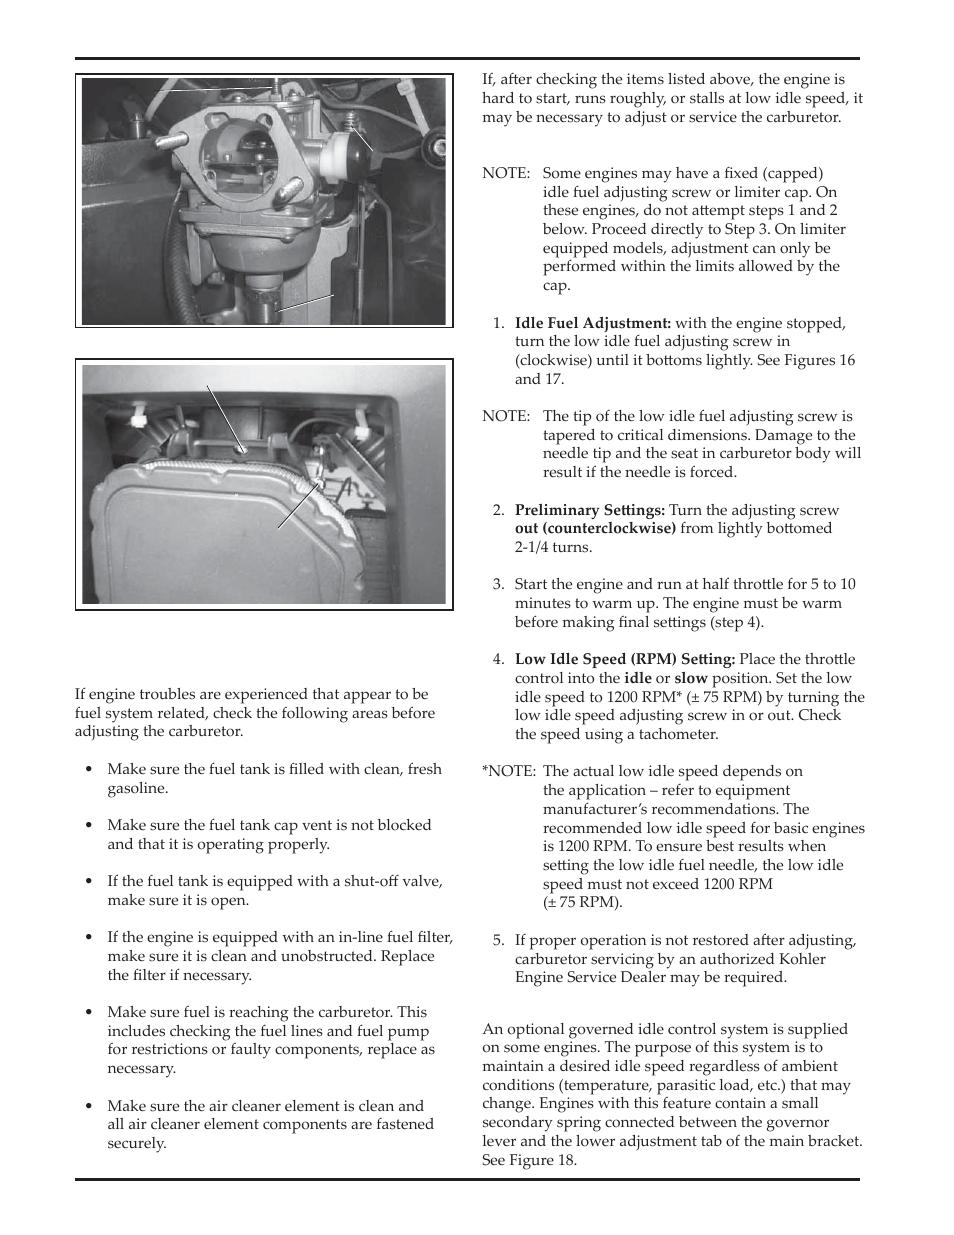 Kohler Courage SV720 User Manual | Page 12 / 20 | Also for